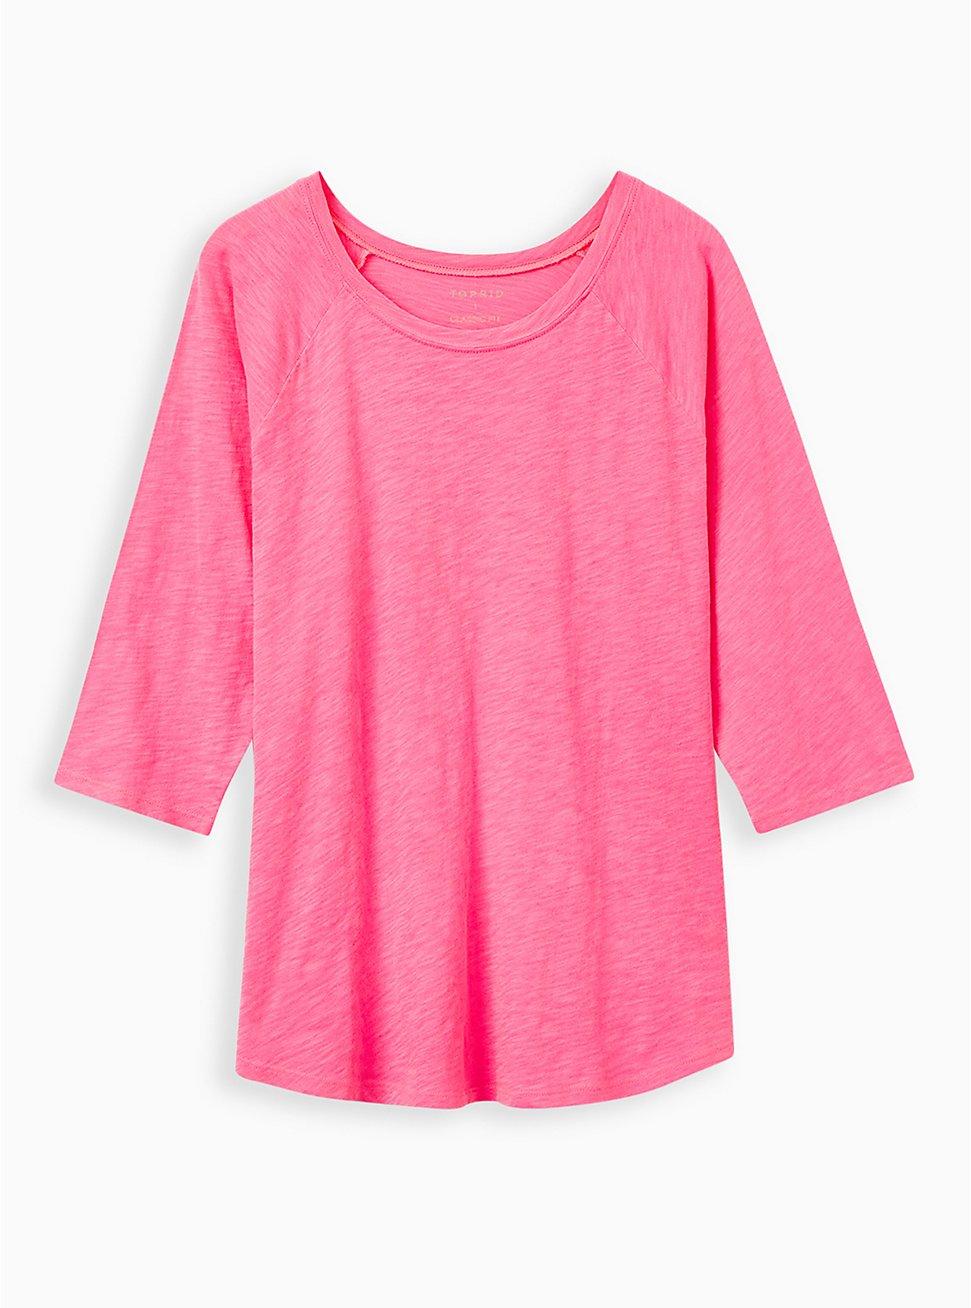 Raglan Tee - Heritage Cotton Neon Pink, PINK GLO, hi-res